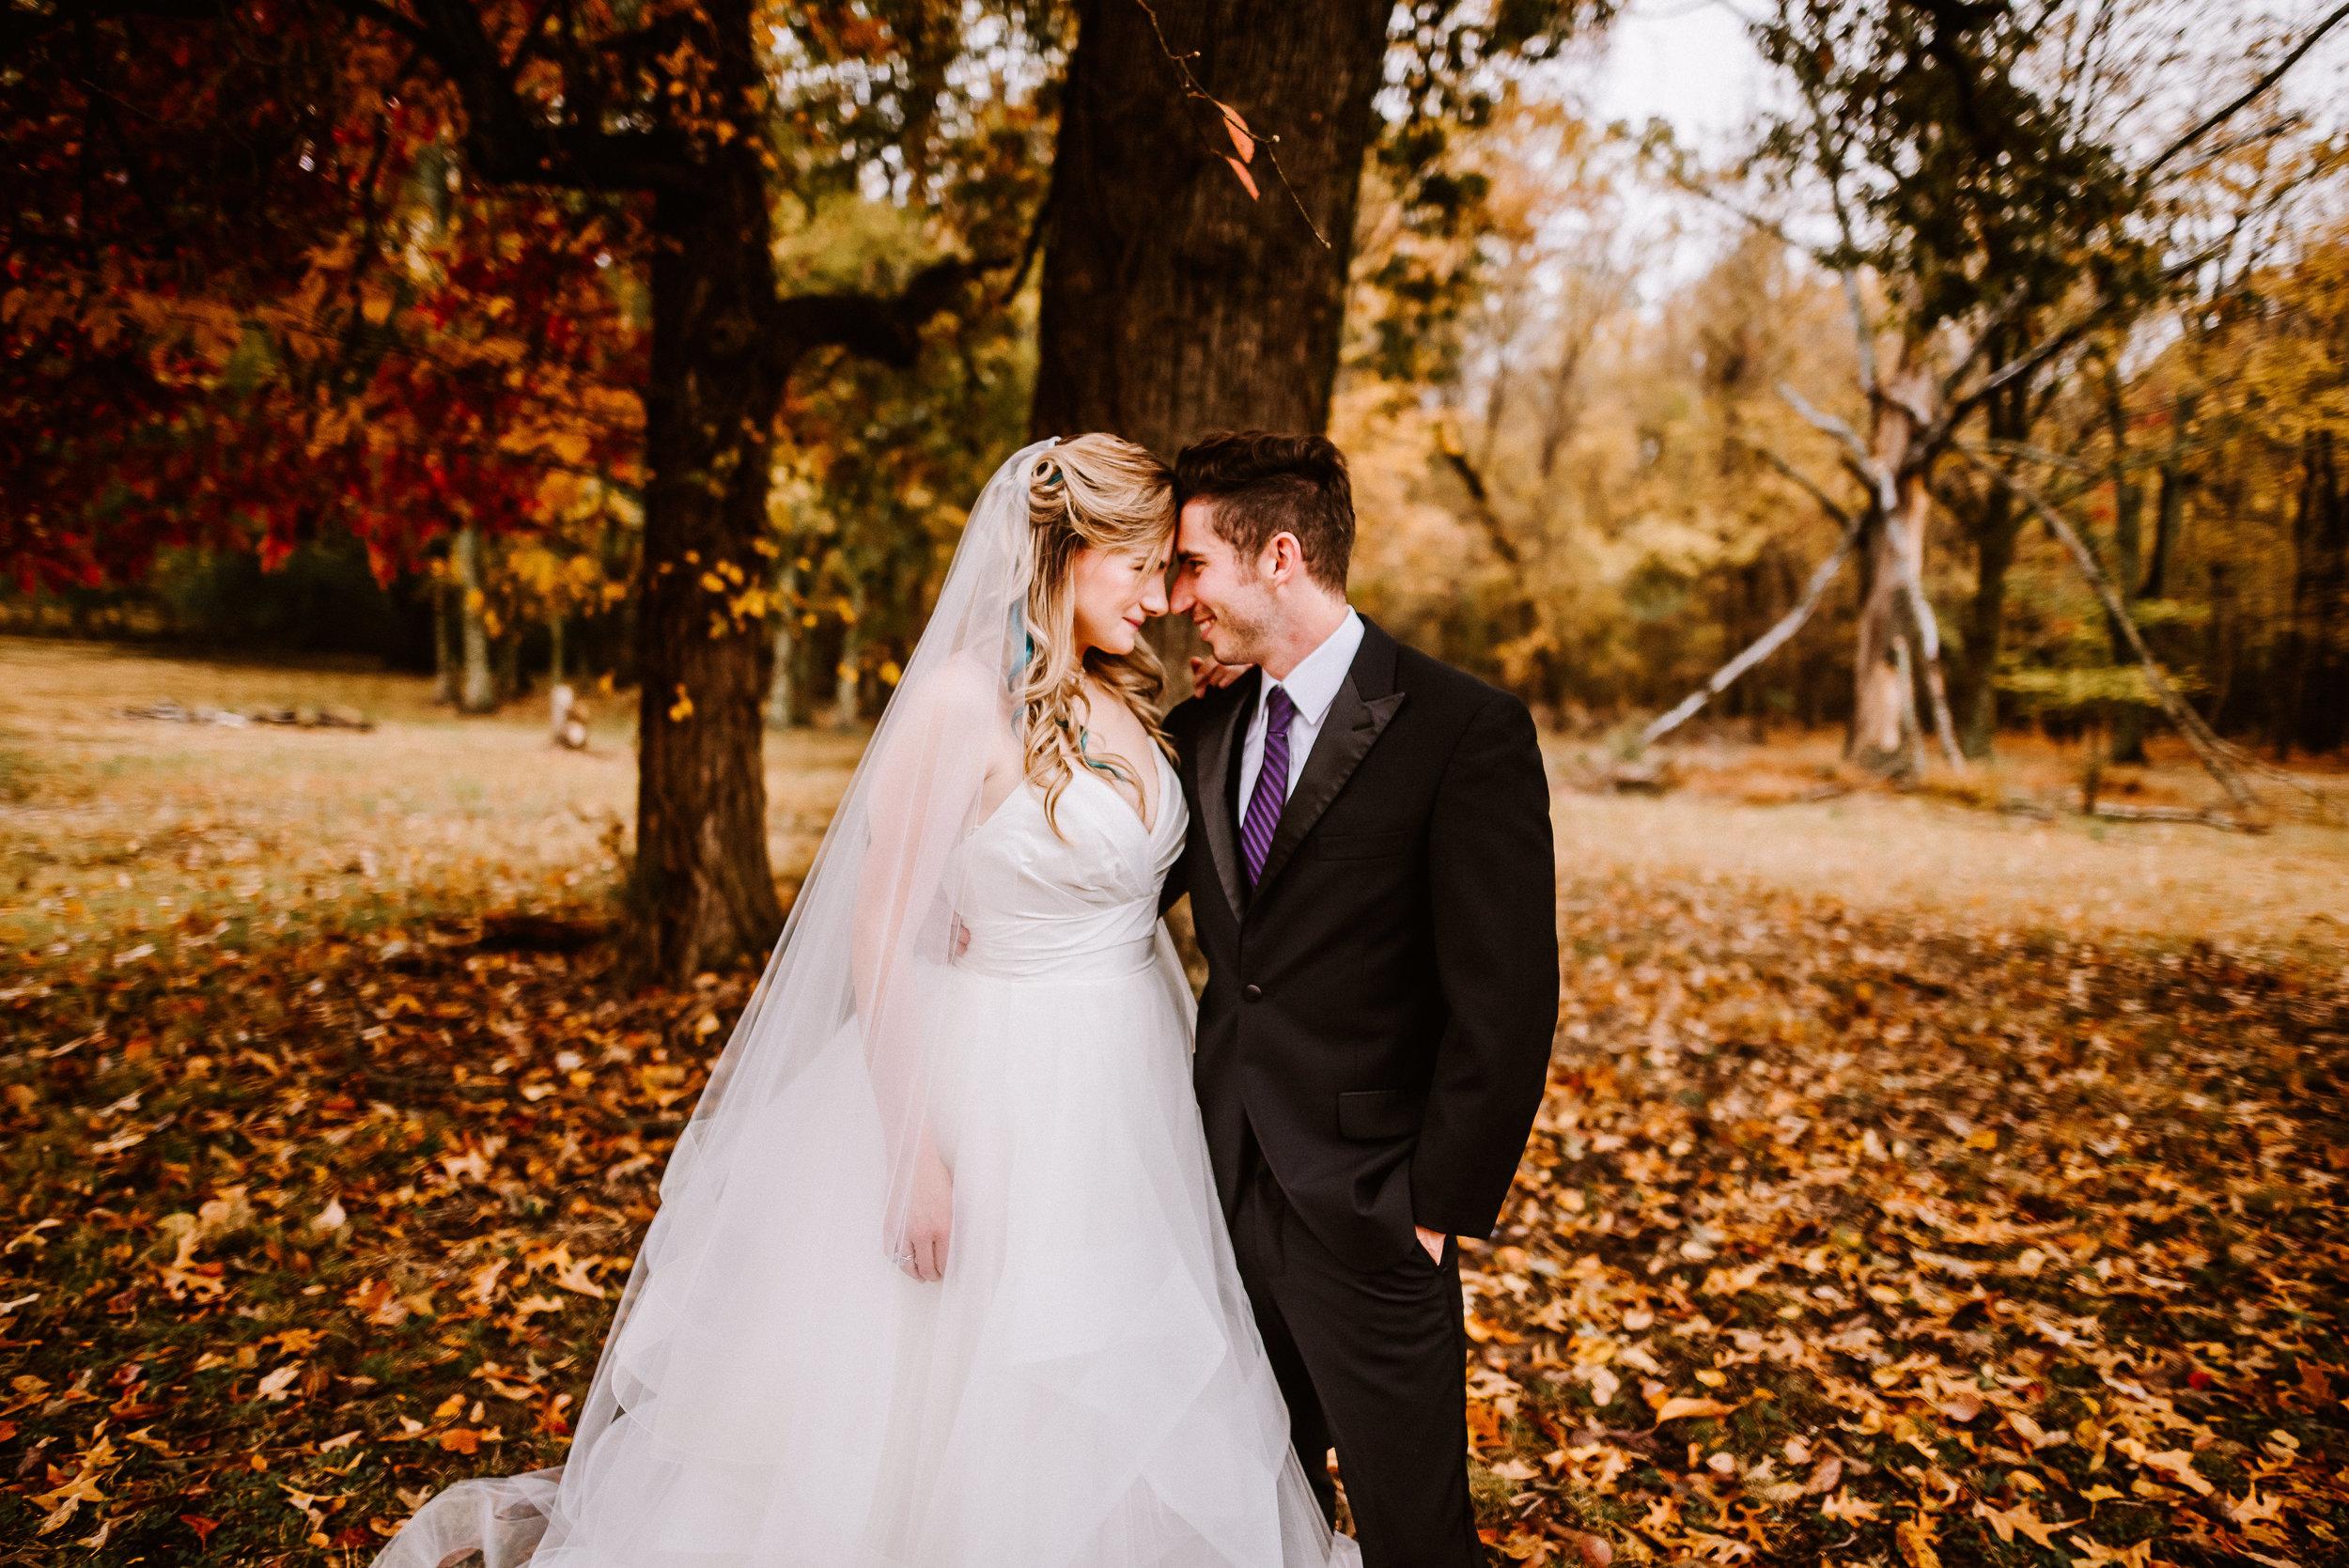 Lucchesi-Wedding_Shelby-Farms_Ashley-Benham-Photography-185.jpg